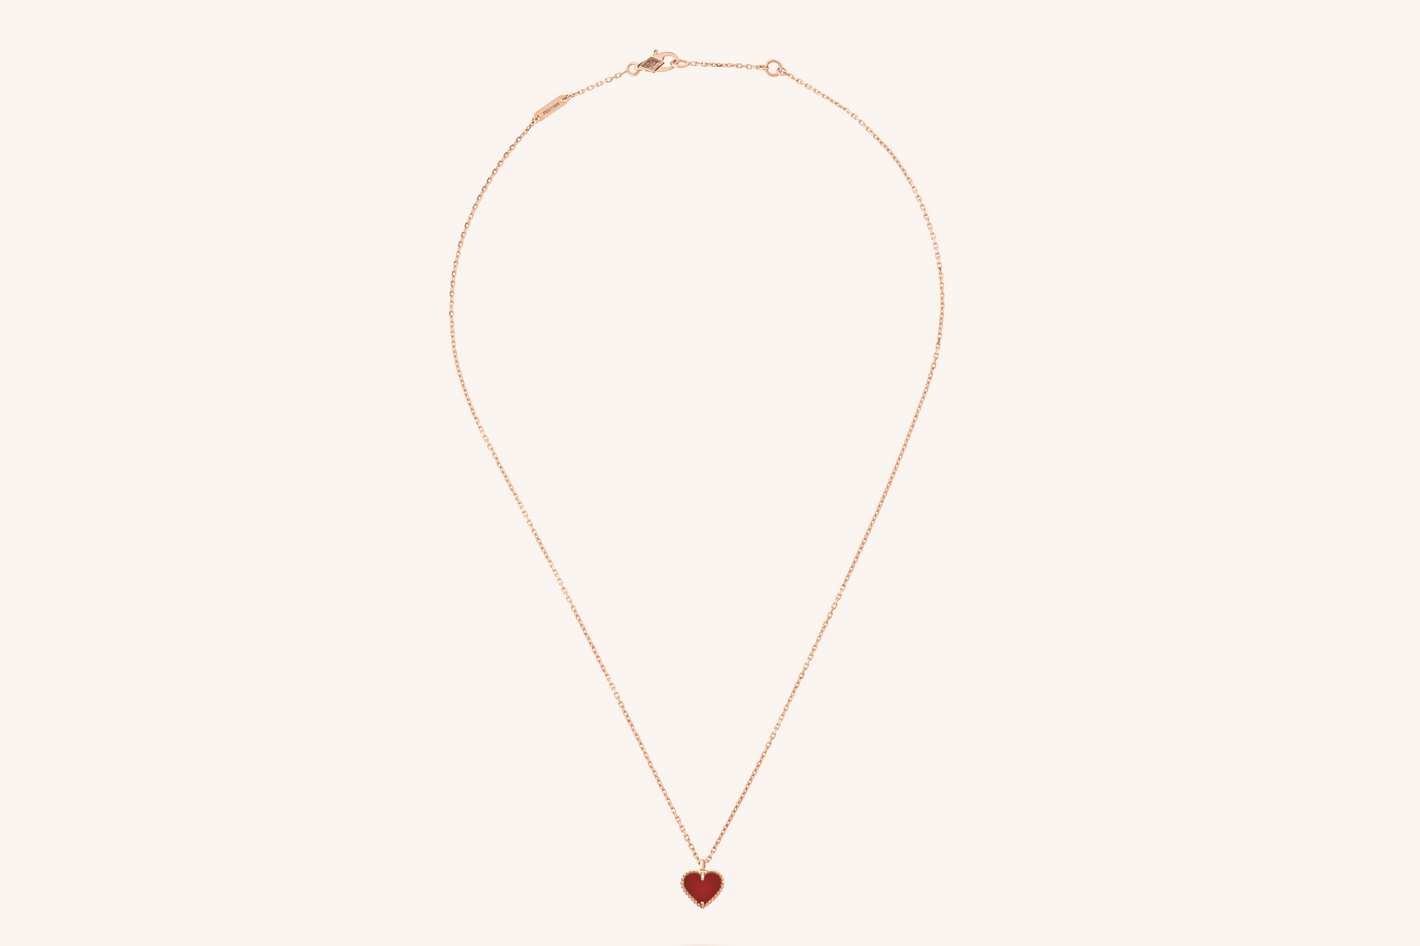 Van Cleef & Arpels Sweet Alhambra Heart Pendant